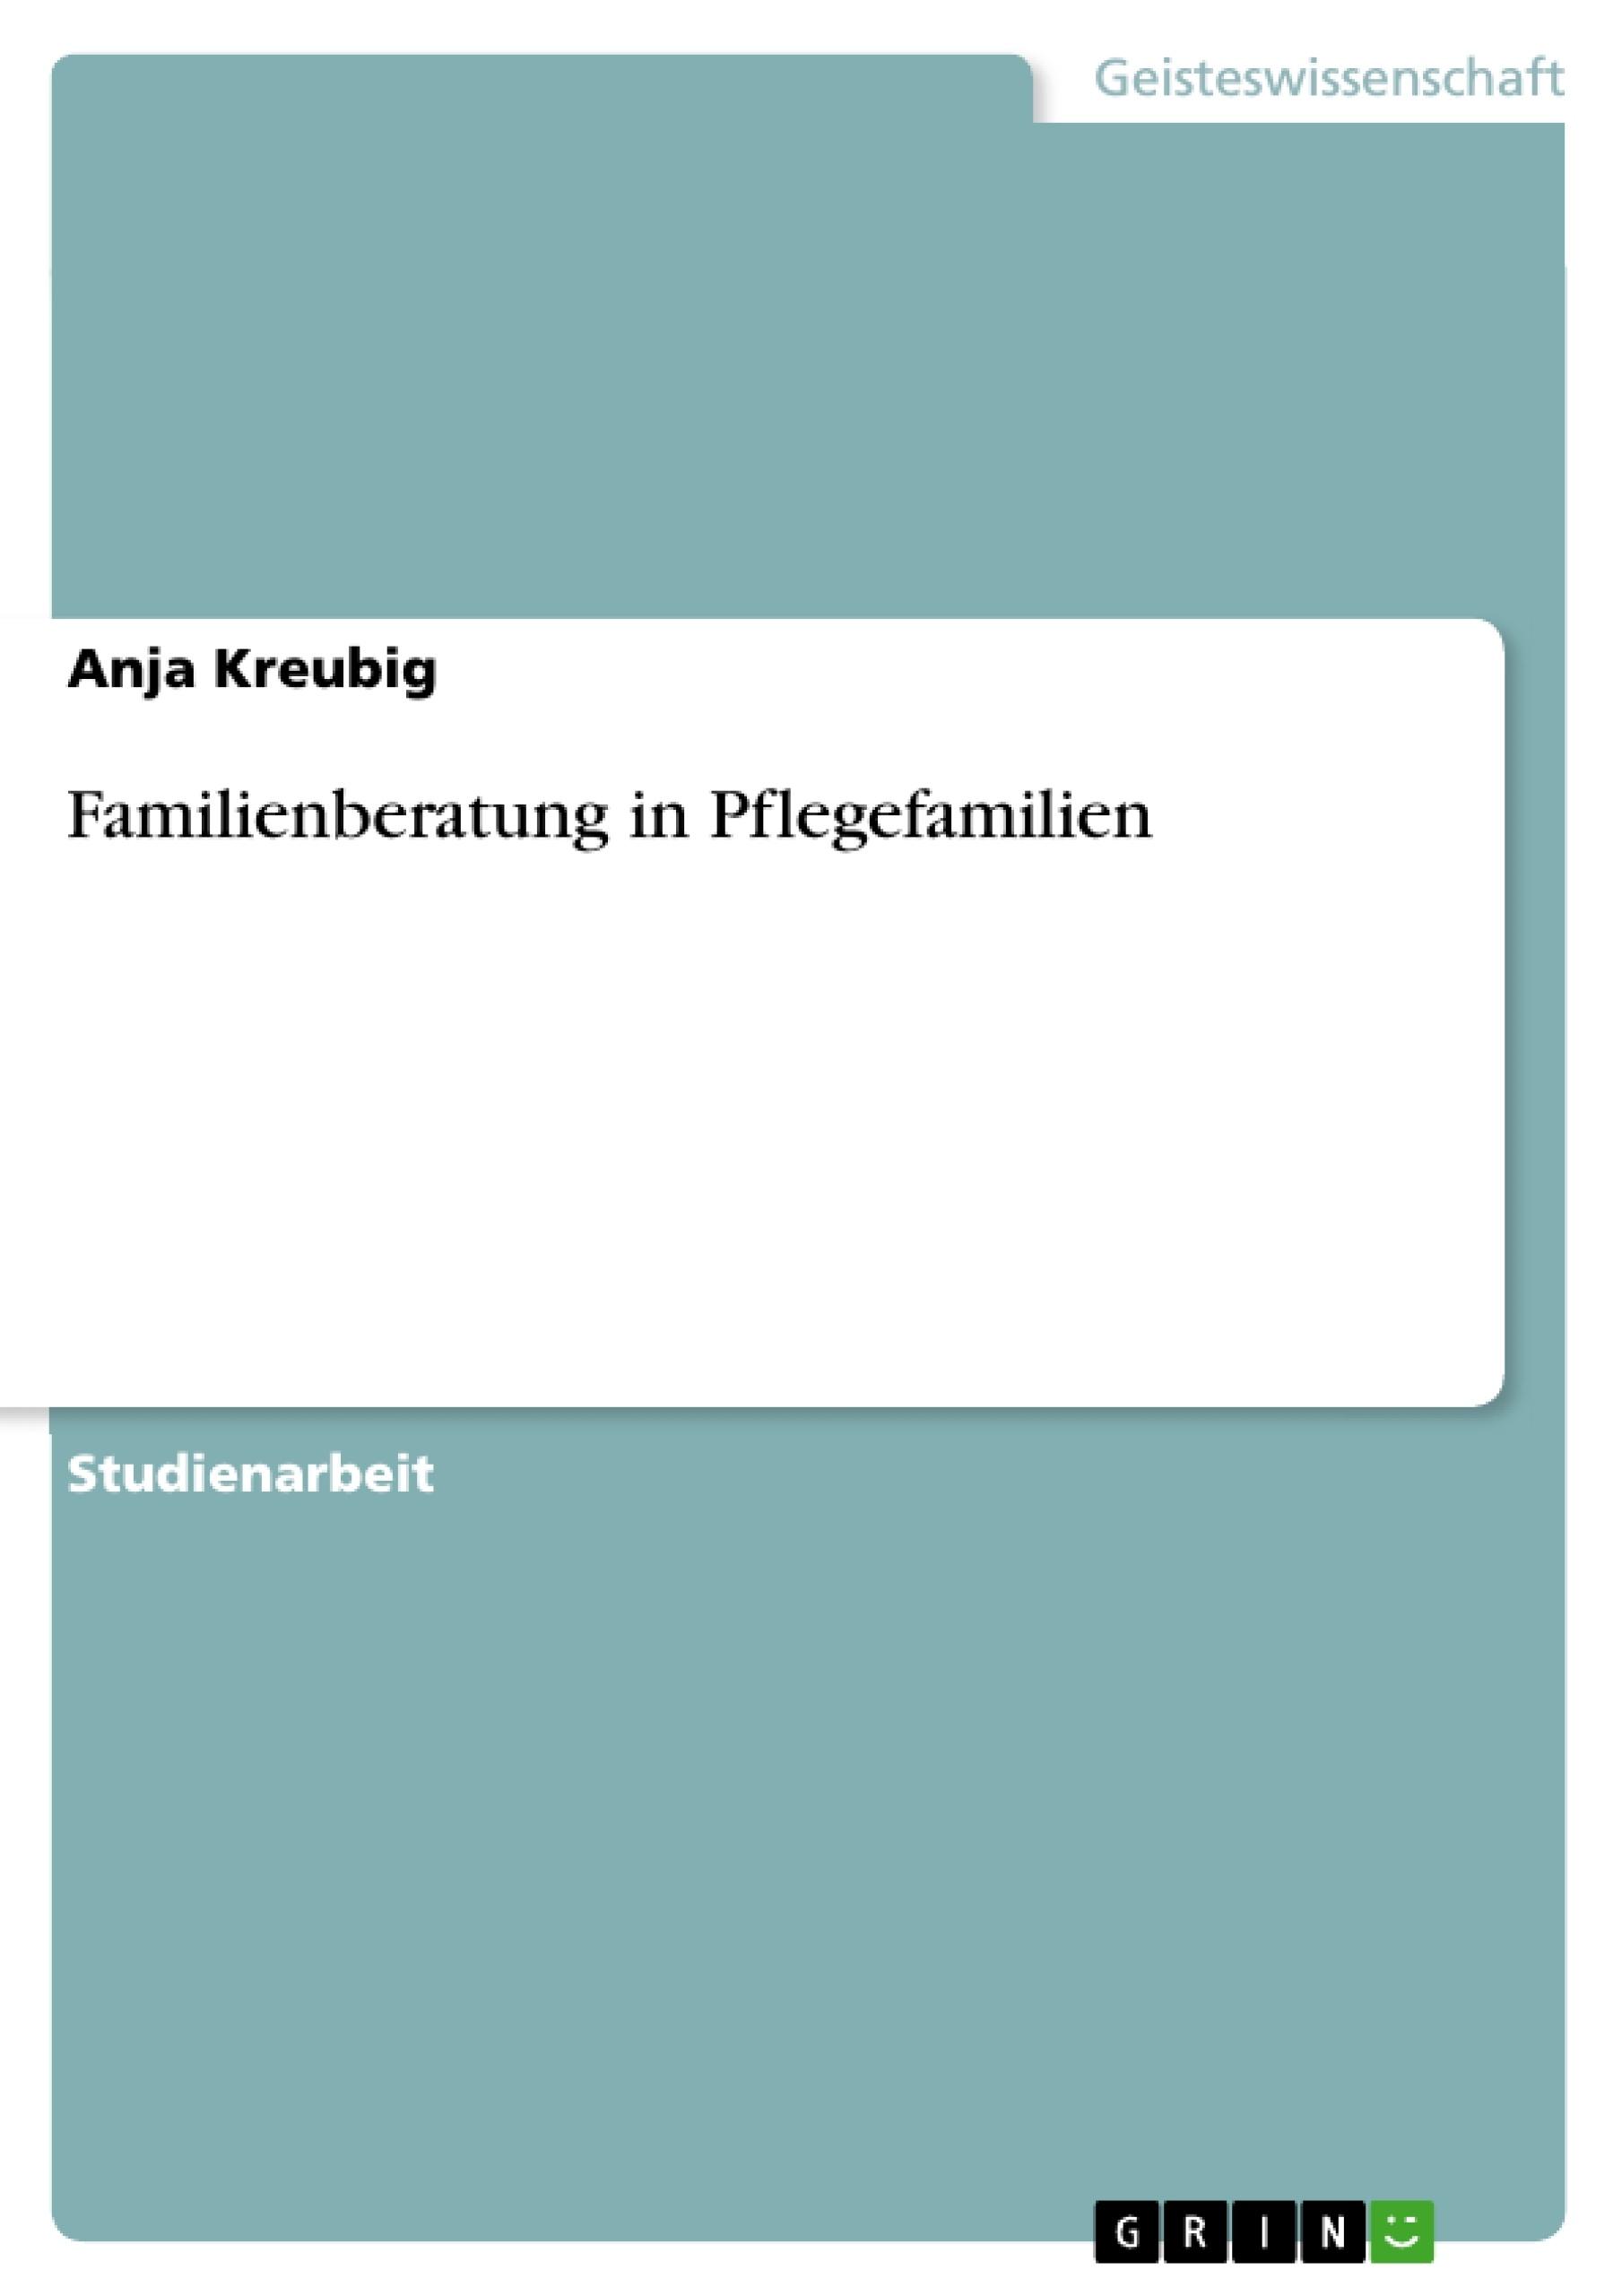 Titel: Familienberatung in Pflegefamilien